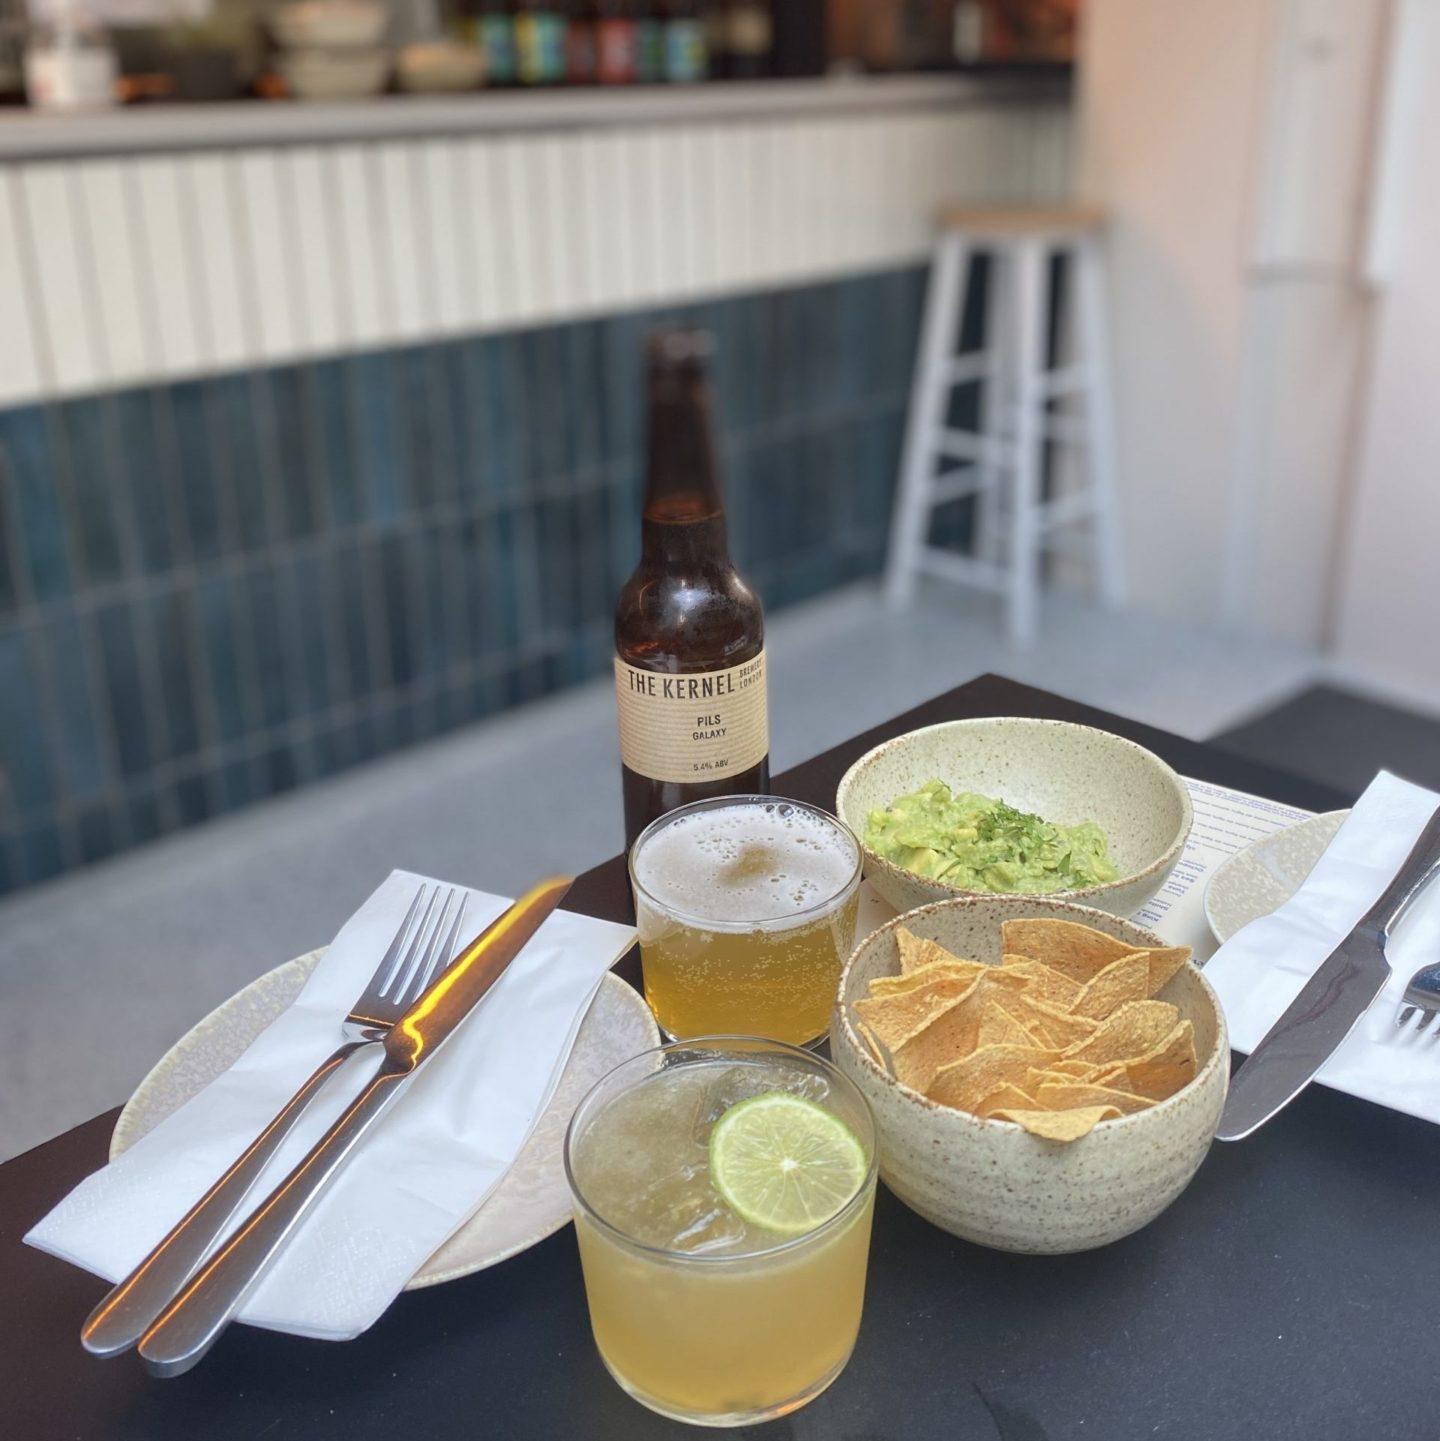 crudo cevicheria guacamole and beer